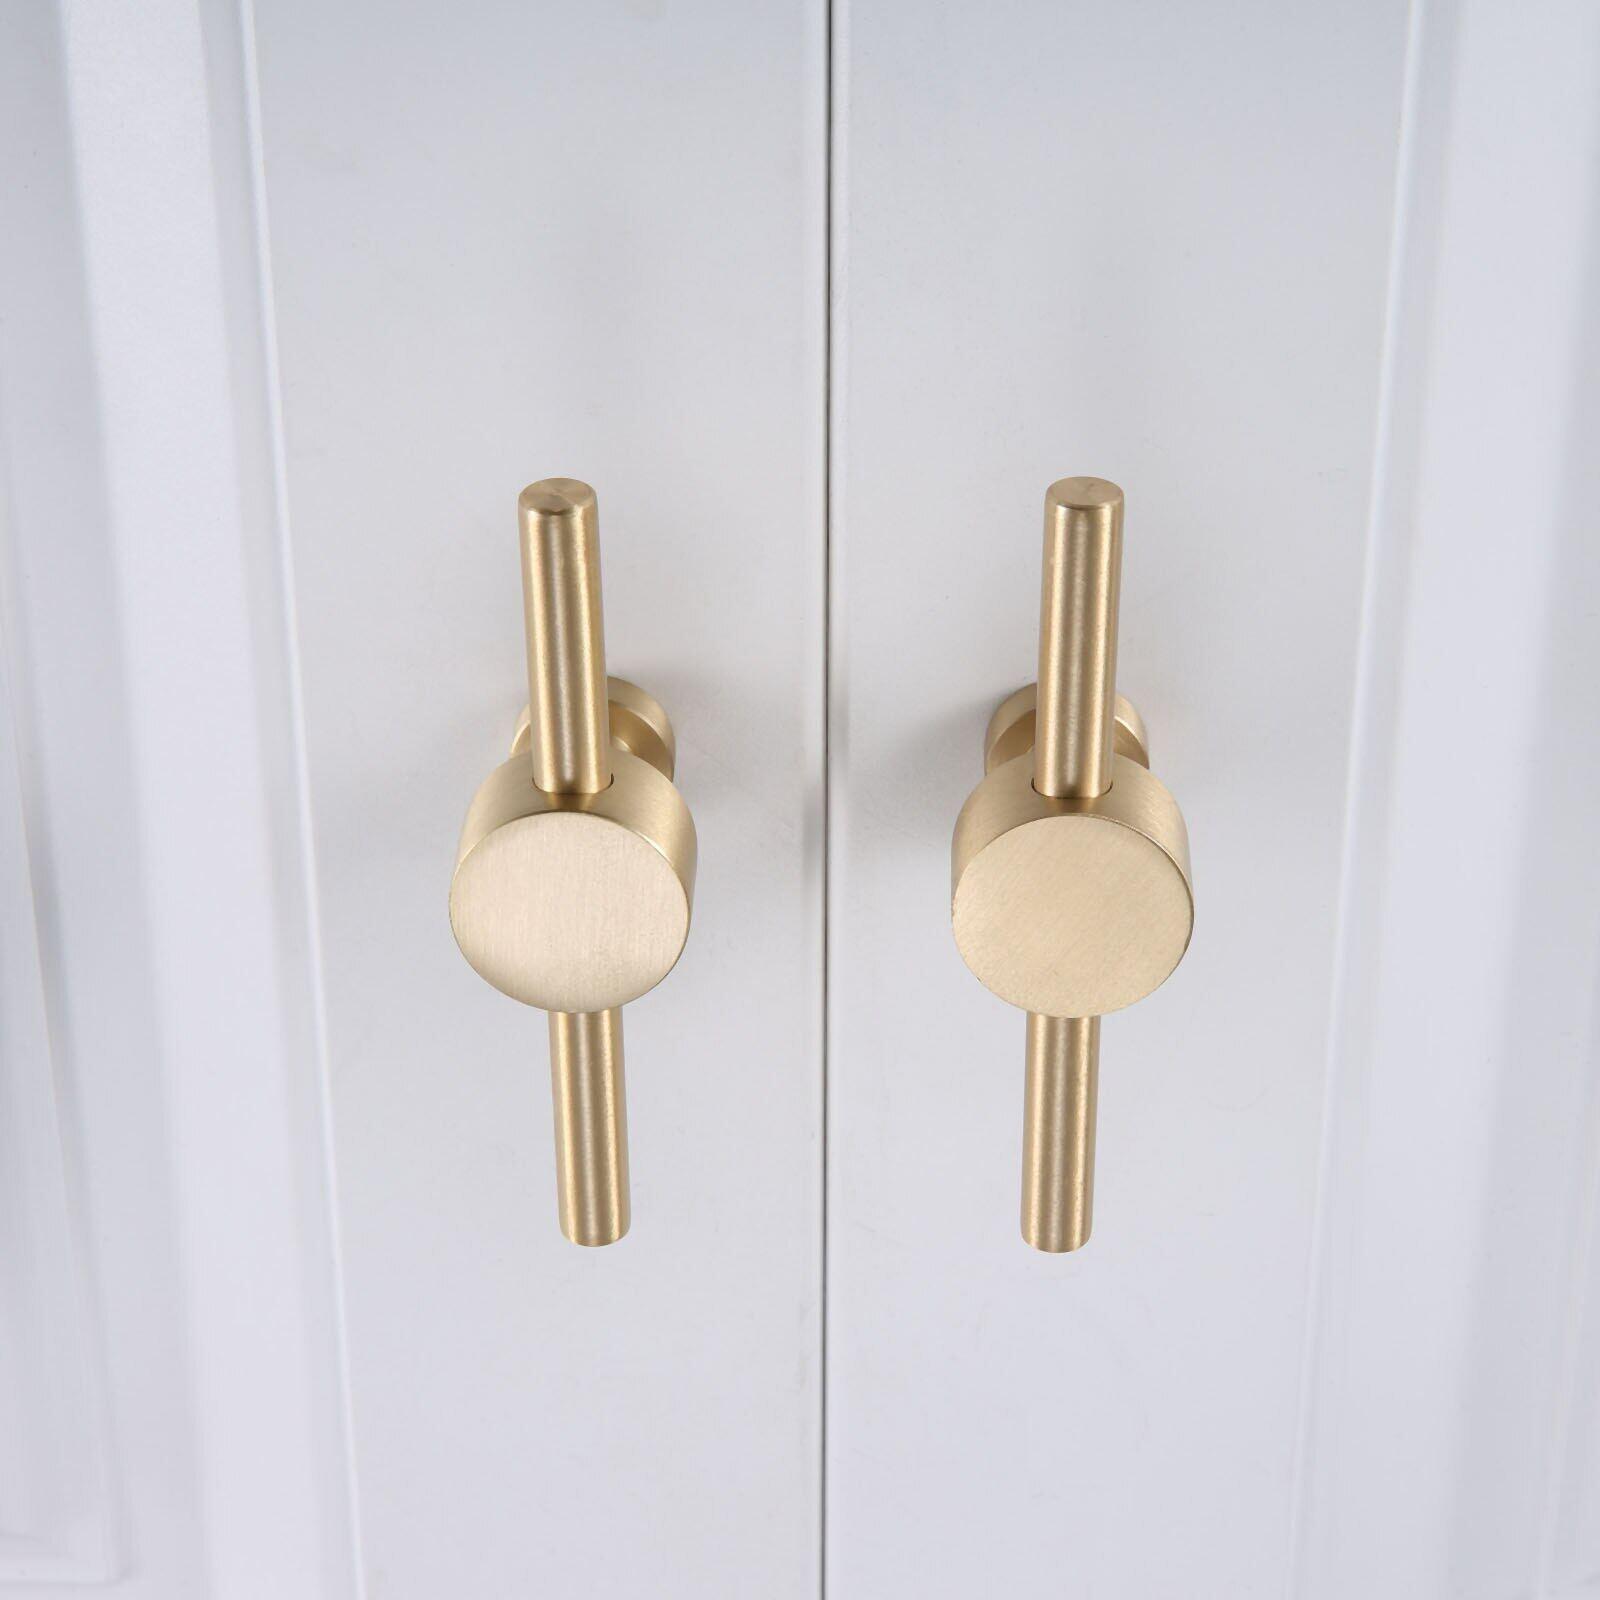 1pc 90mm T Bar Furniture Knobs Pulls Copper Kitchen Cabinet Door Handles Drawer Knobs Pull Dresser Handles Hardware Lazada